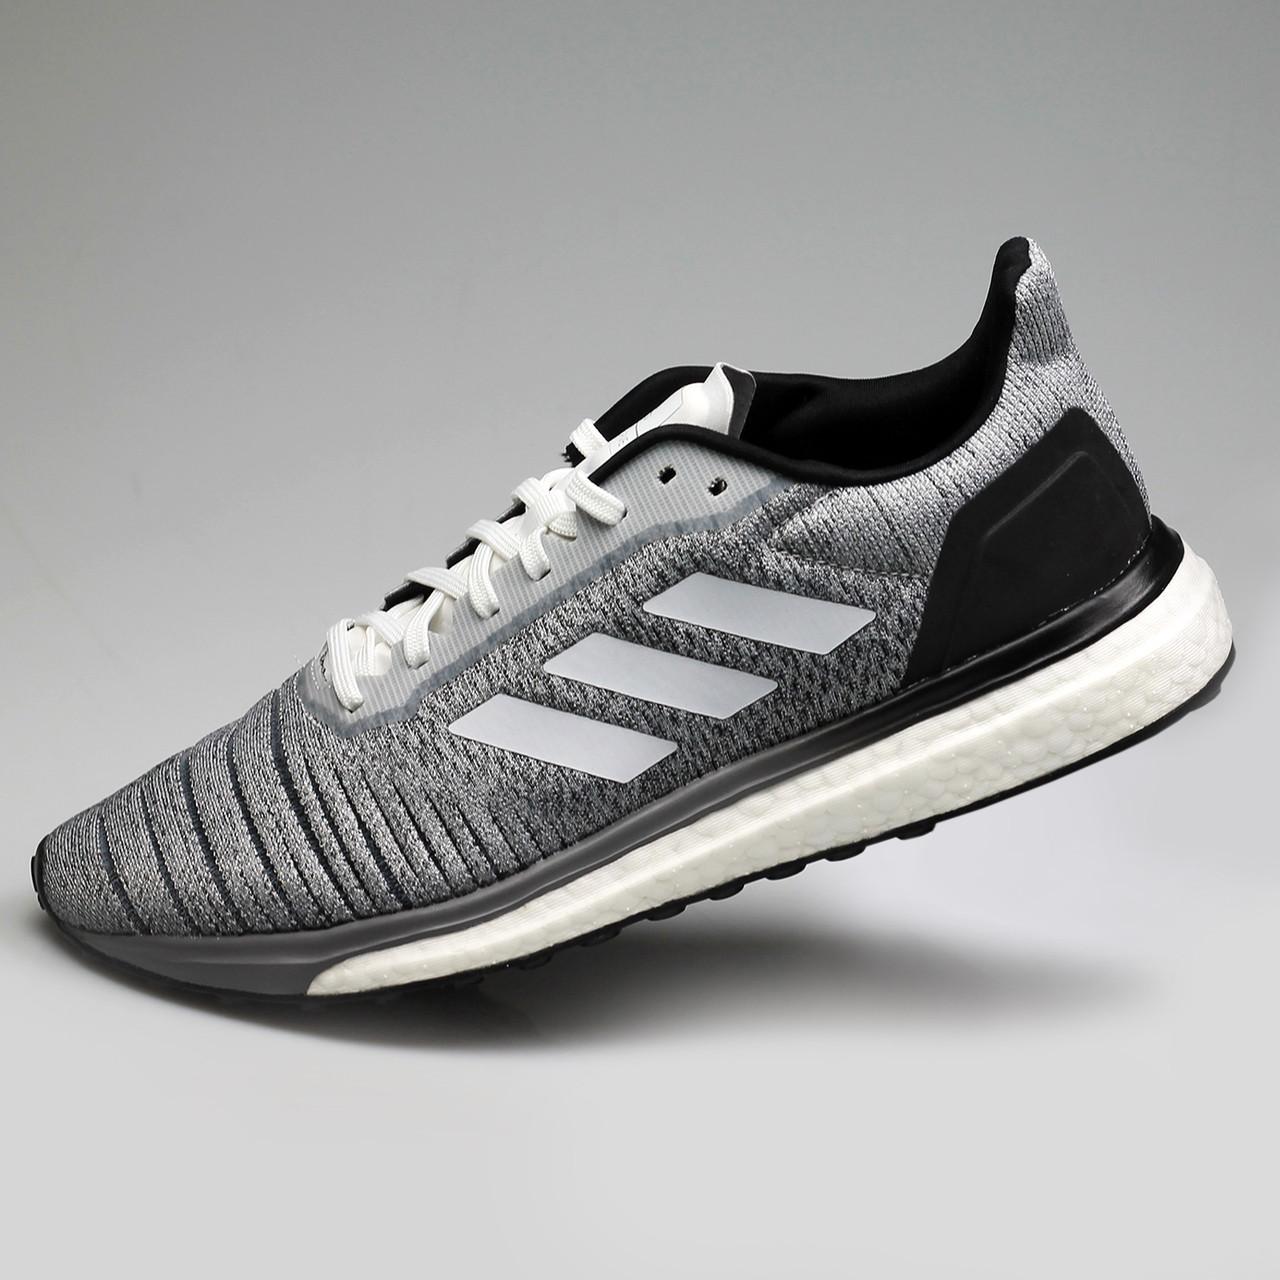 65b4375e8 ... Adidas Solar Drive Men s Running Sneakers AQ0337 ...